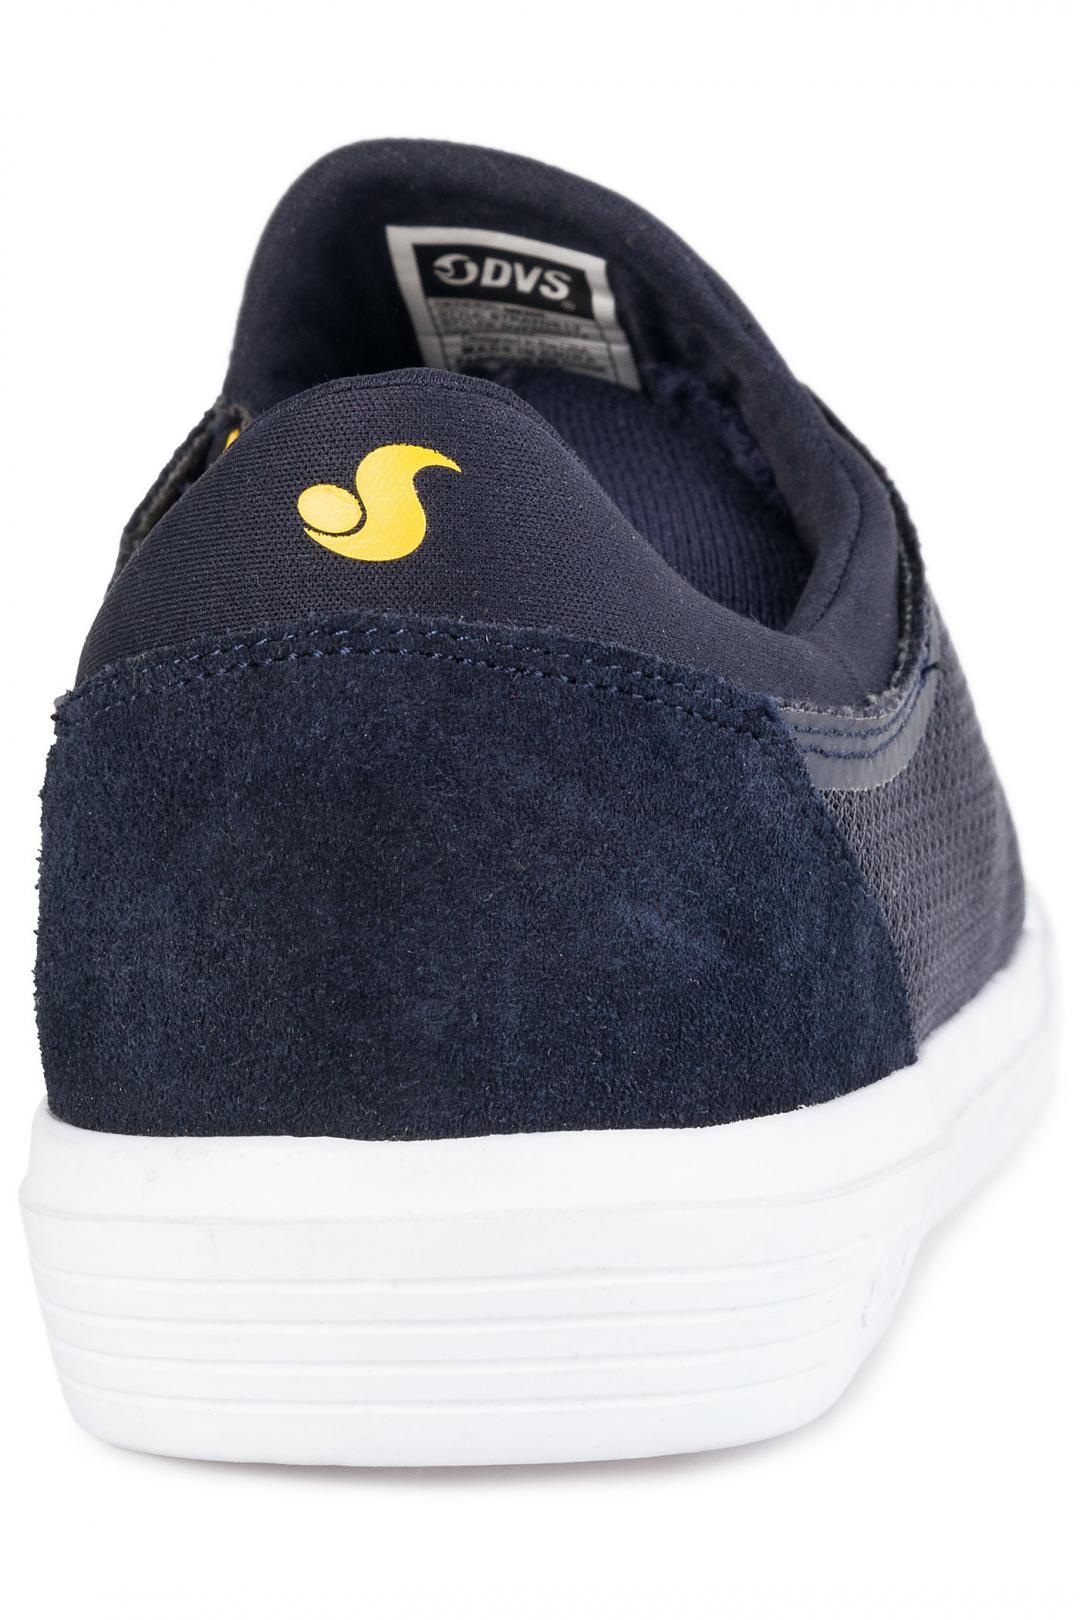 Uomo DVS Stratos LT navy mesh | Sneakers low top